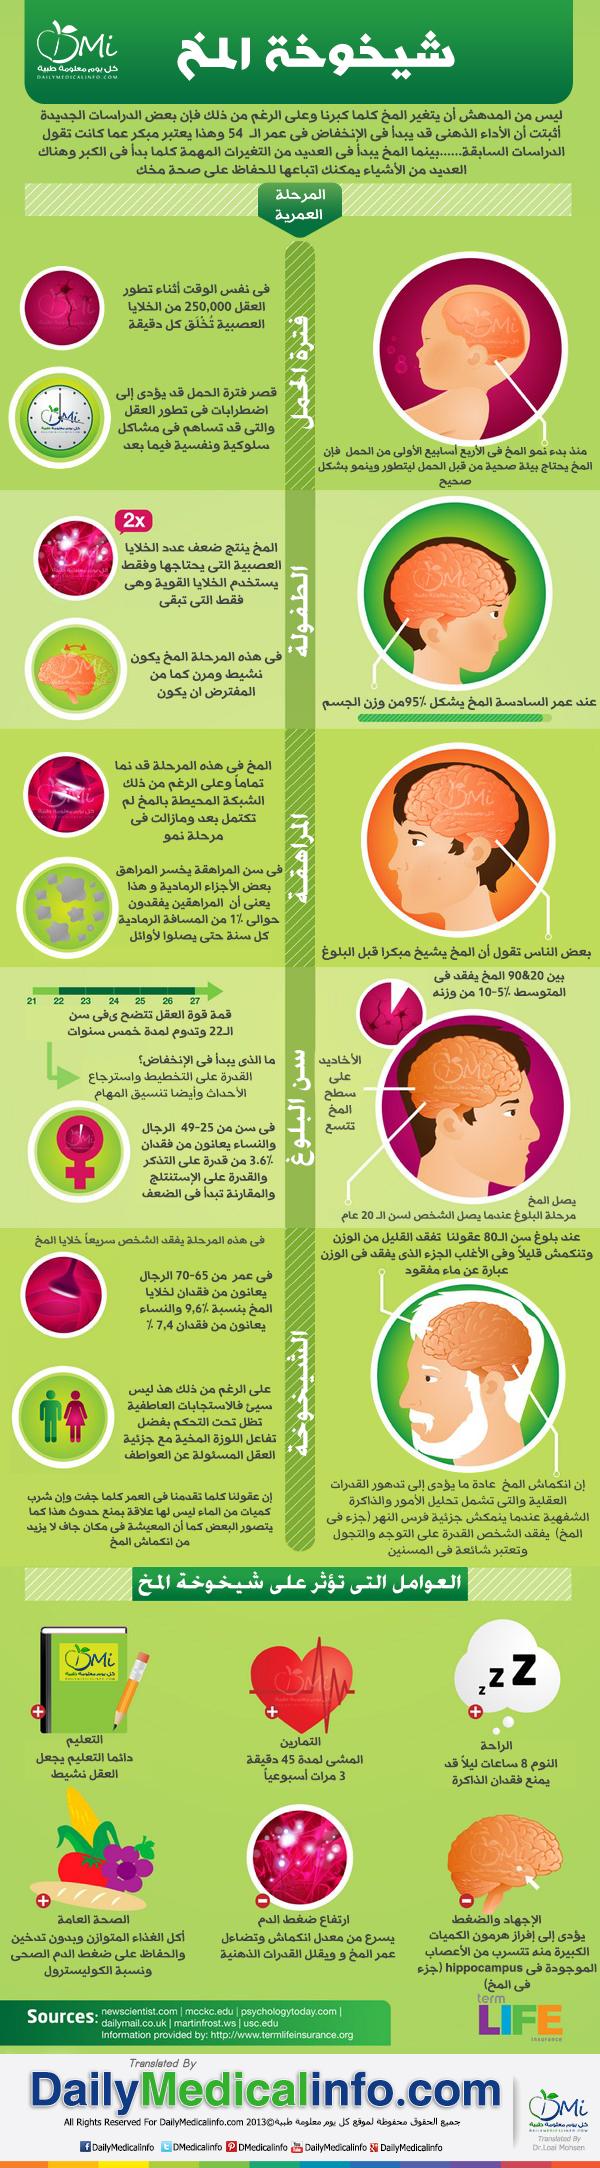 DailyMedicalinfo Brain age